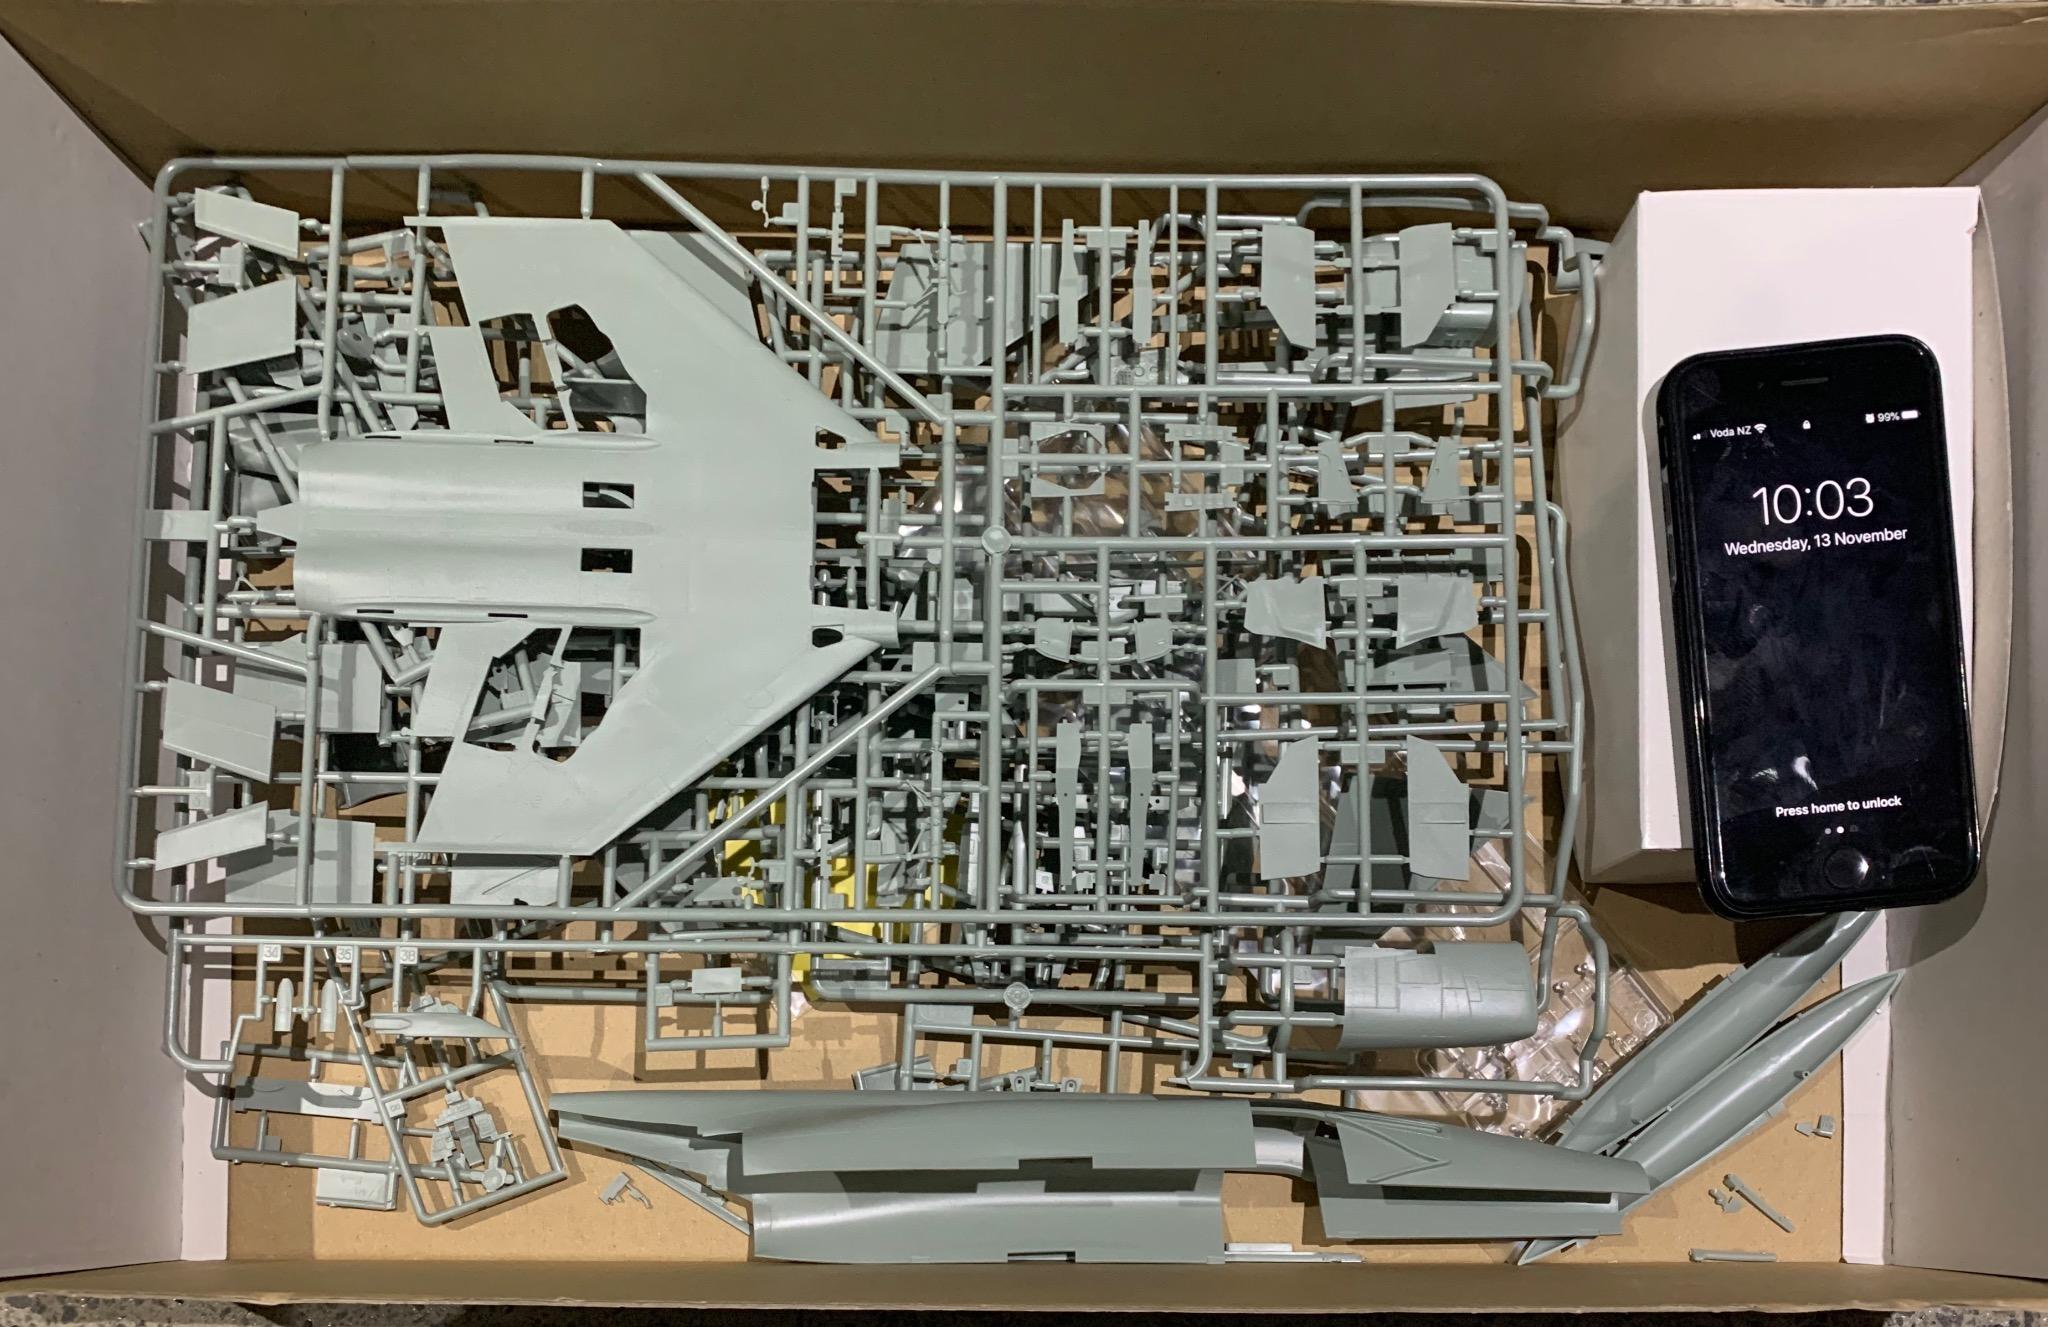 8D6B7BD8-321D-4BF0-BC44-A3932AA37C27.jpeg